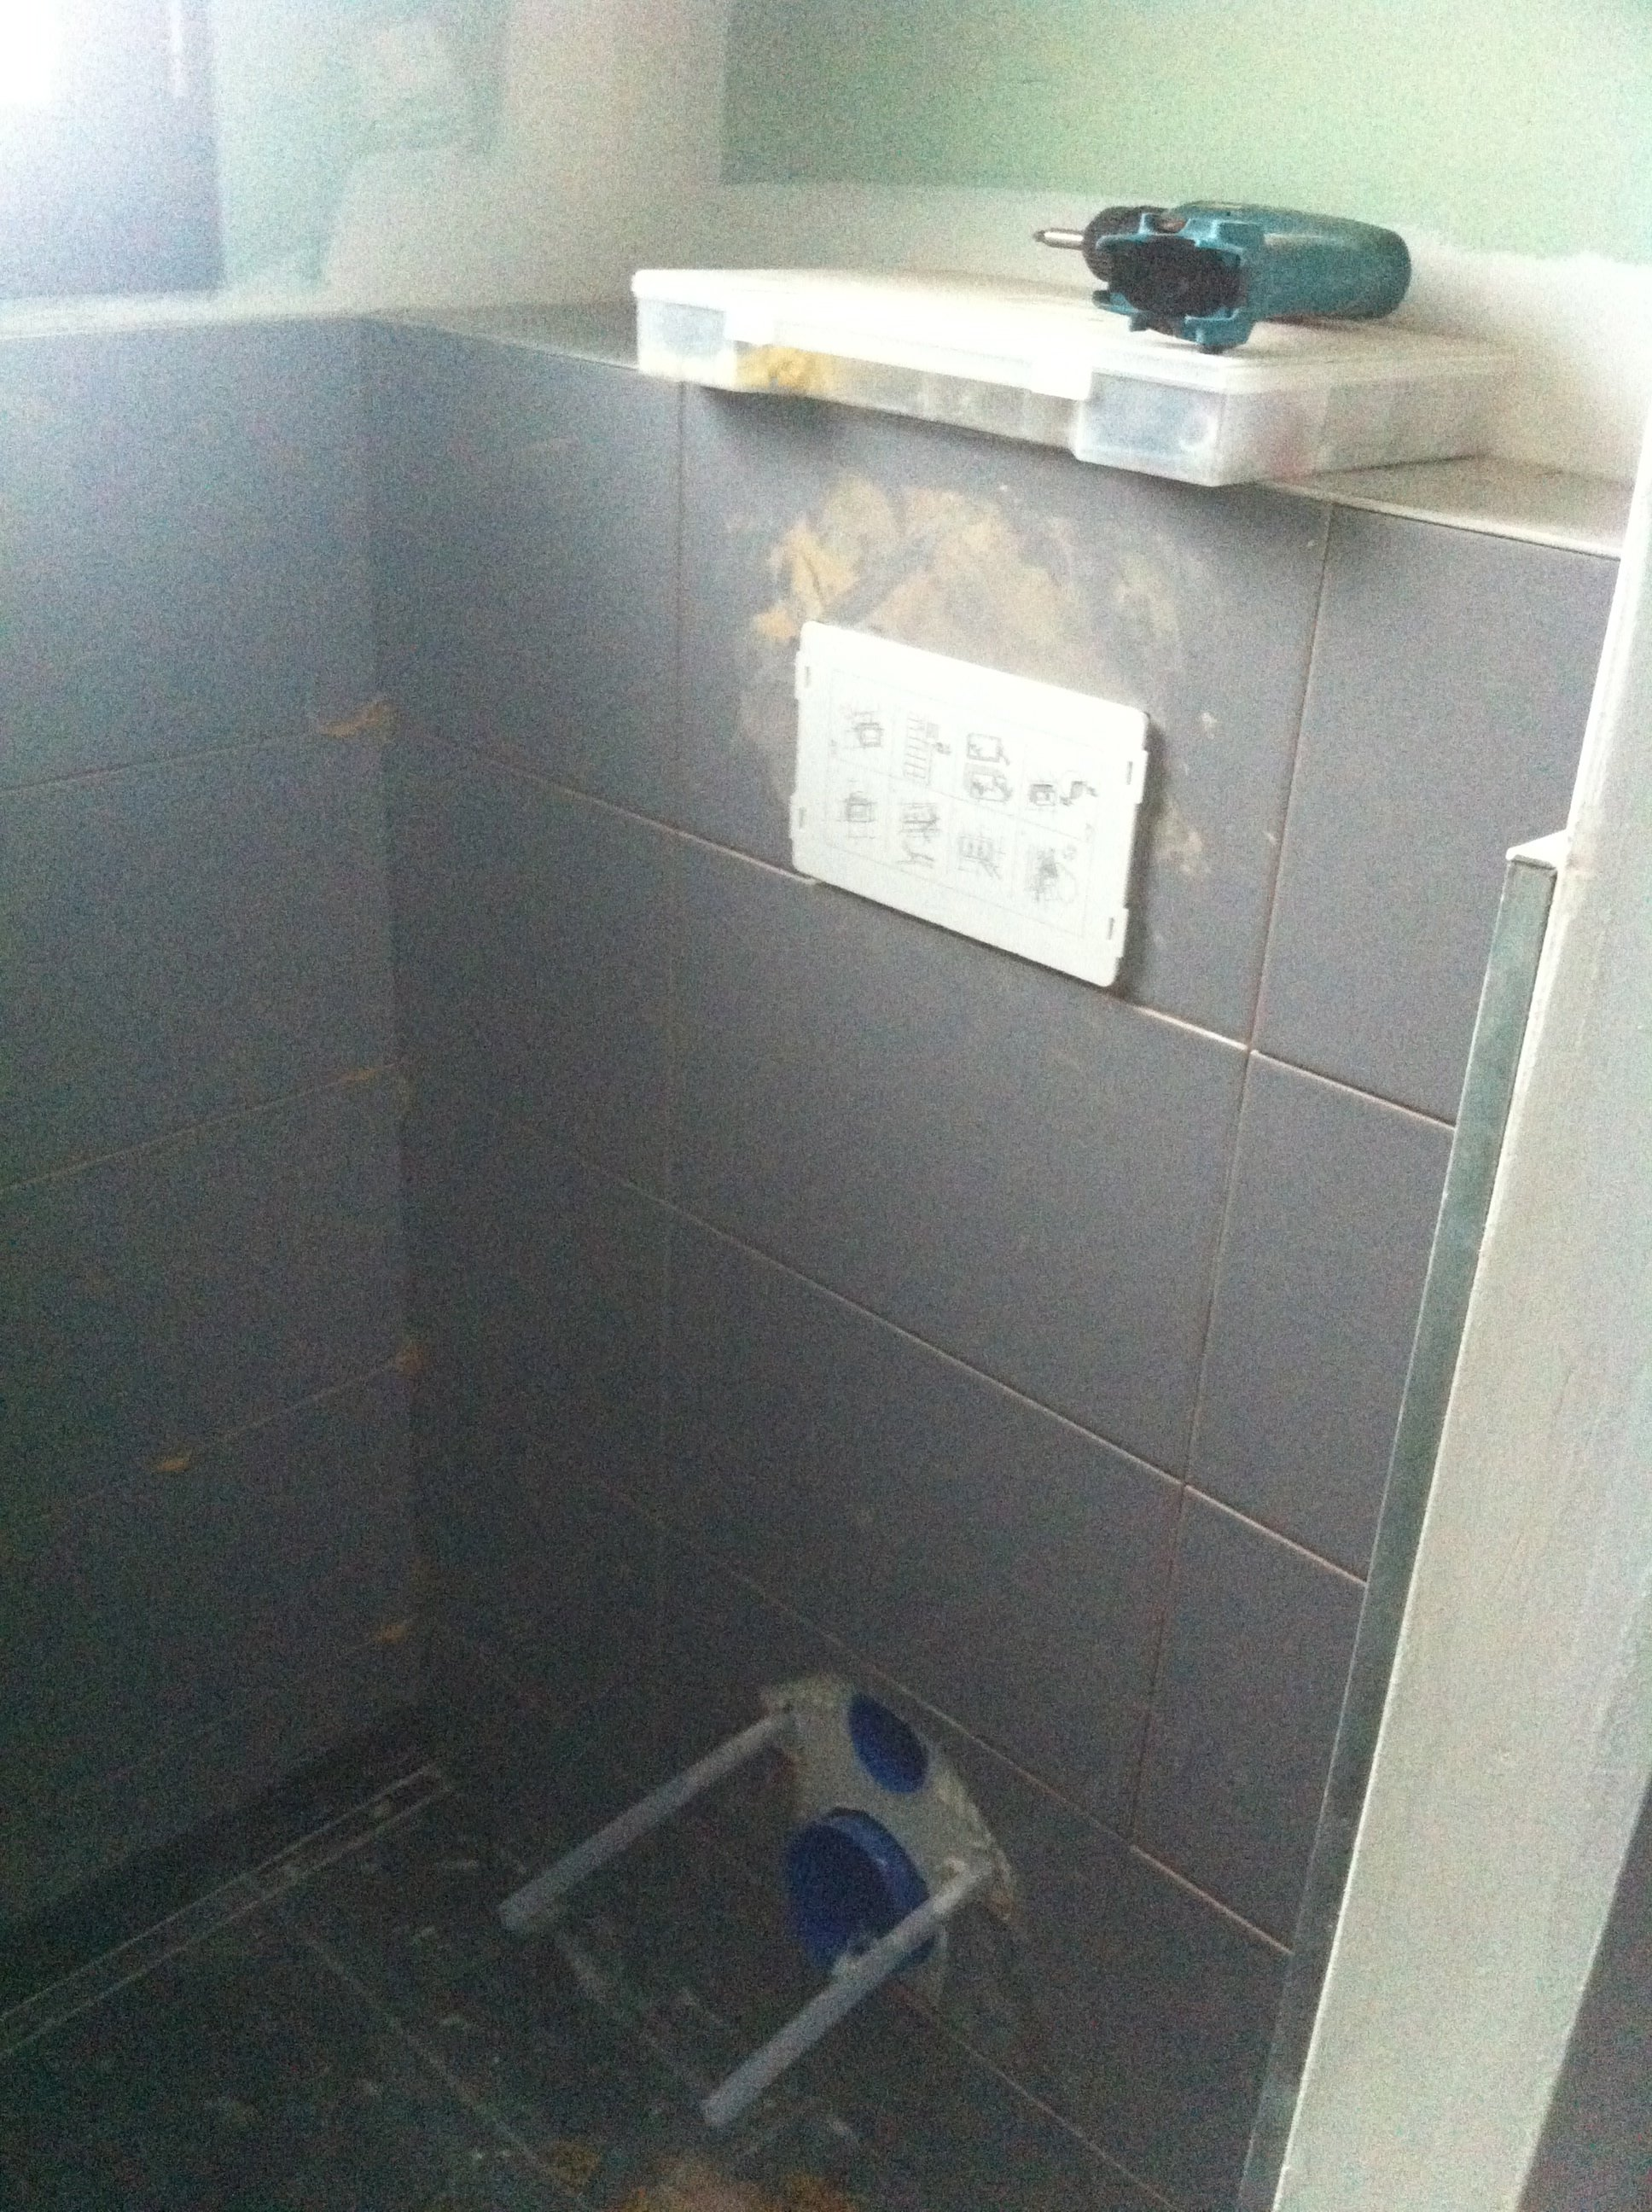 Chezalexetnico fin de la fa ence wc - Faience voor wc ...